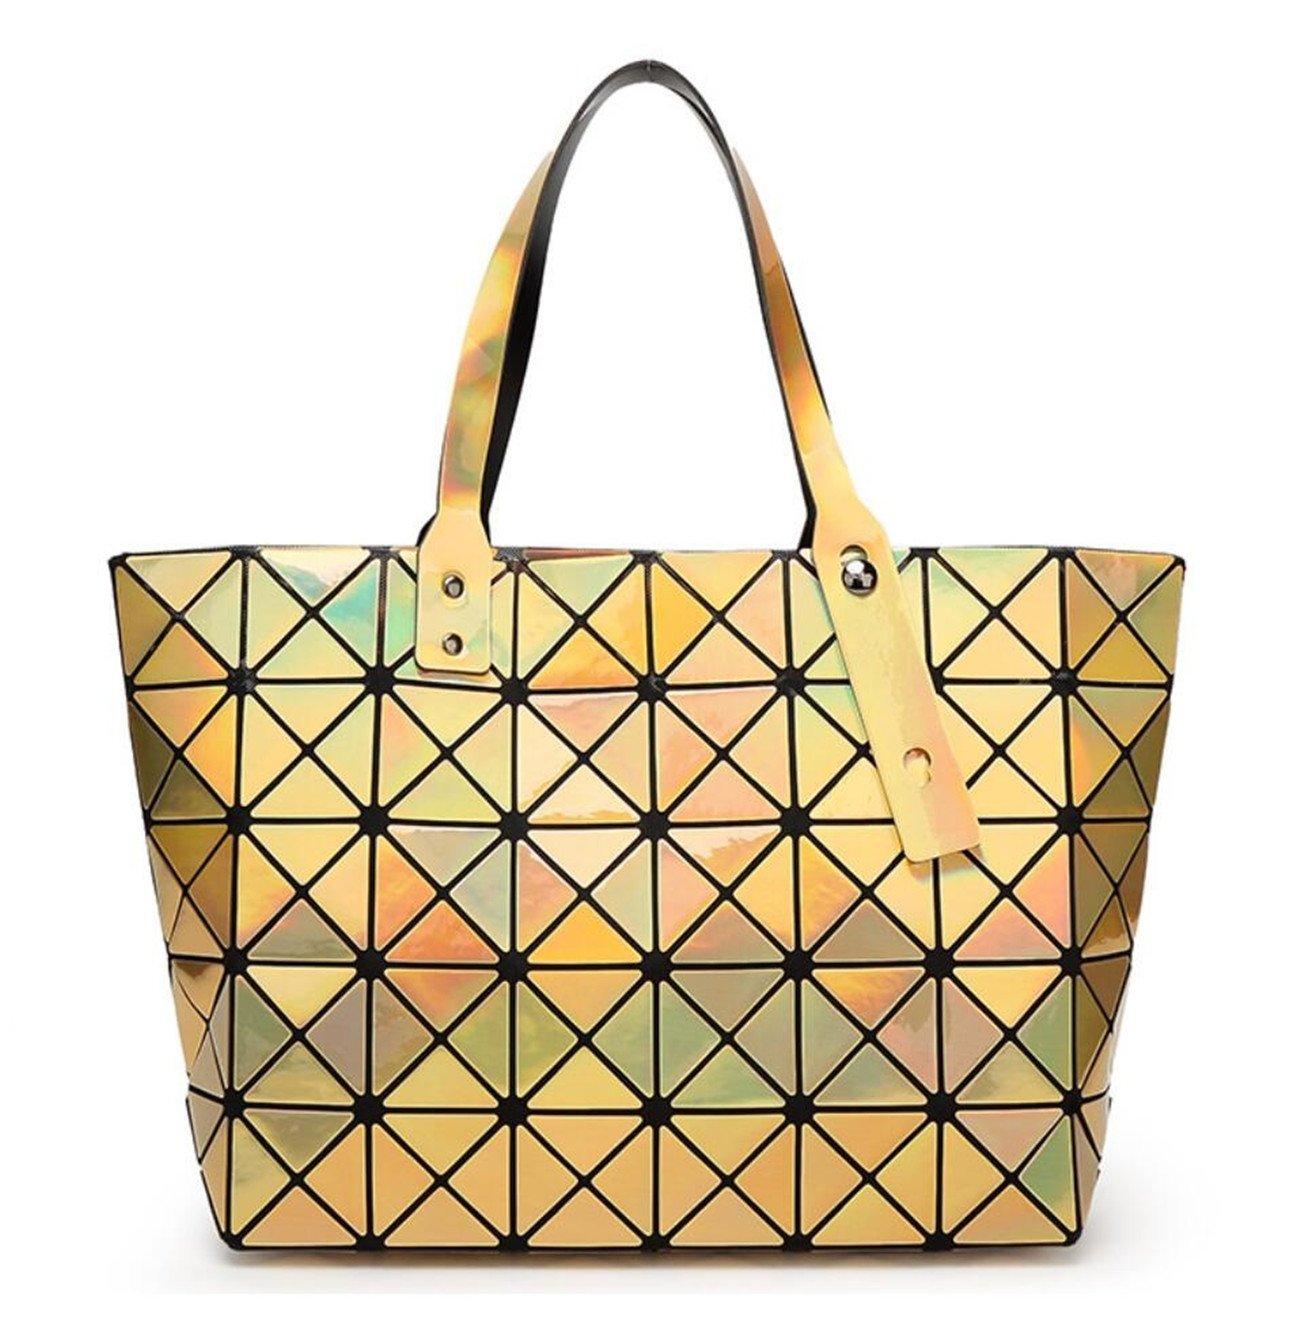 Kayers Sulliva Women's Fashion Geometric Diamond Lattice Tote Glossy PVC Shoulder Bag Top-handle Handbags